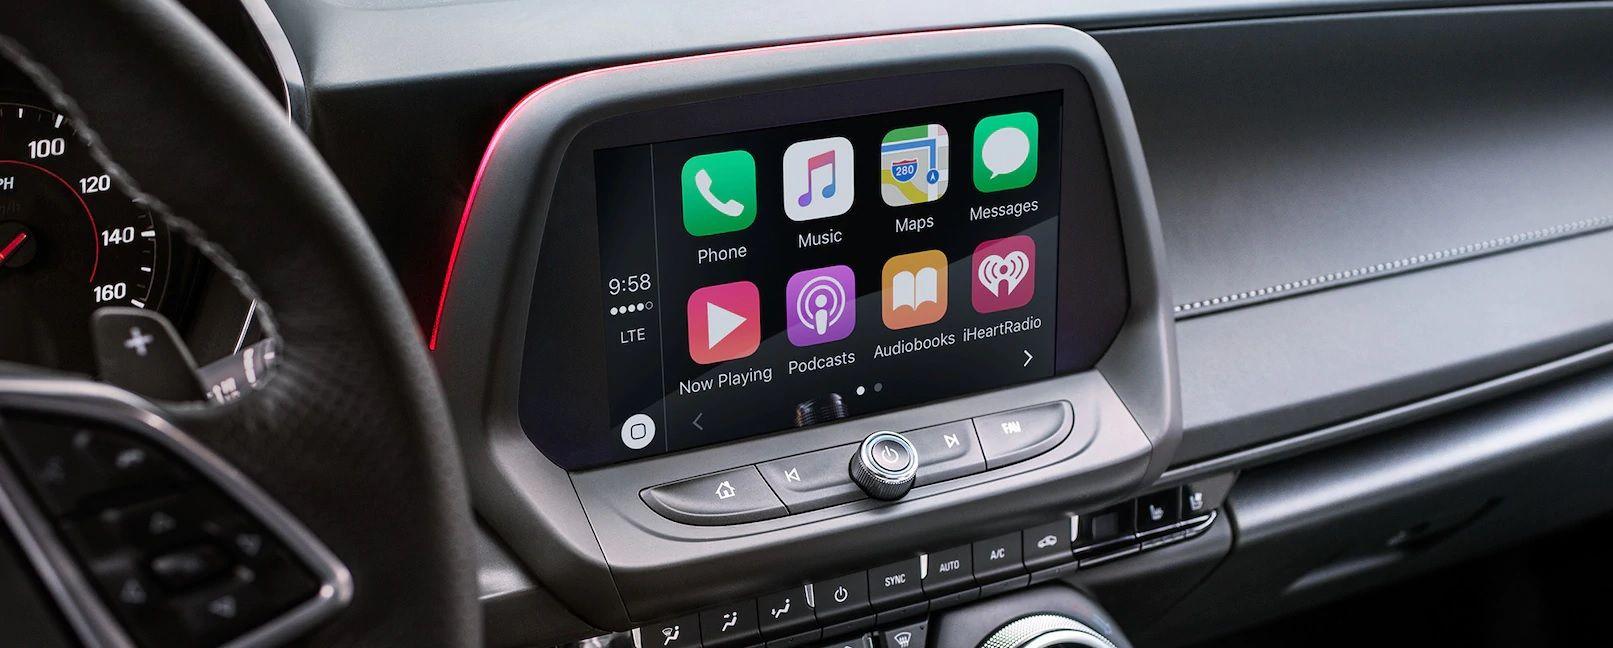 Convenient Connectivity in the Camaro!